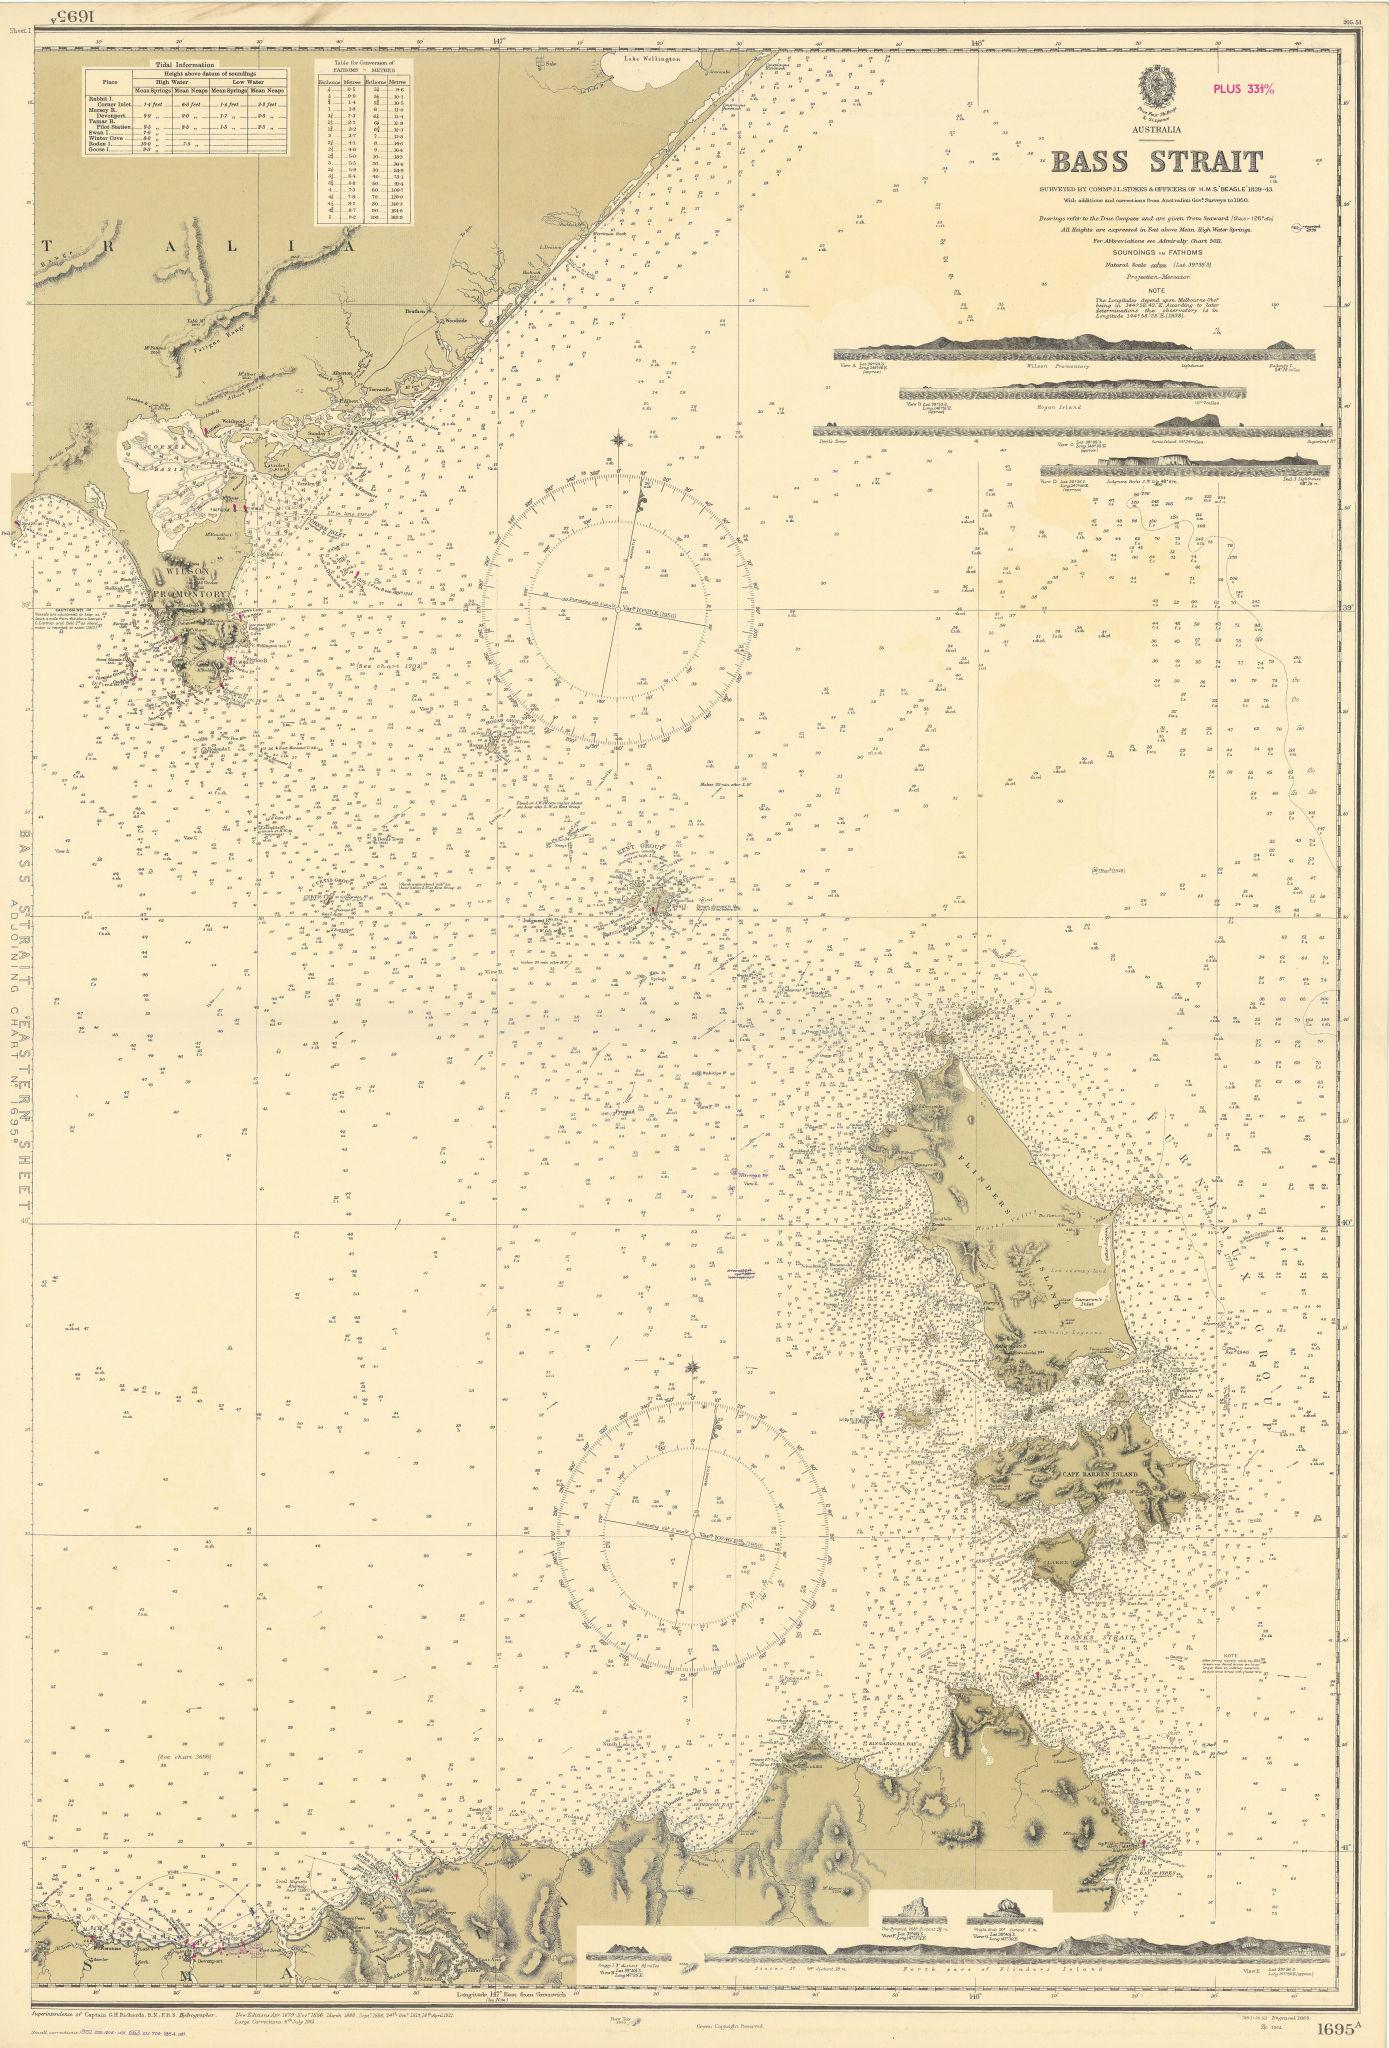 Bass Strait Australia Tasmania Victoria Flinders ADMIRALTY chart 1868 (1954) map